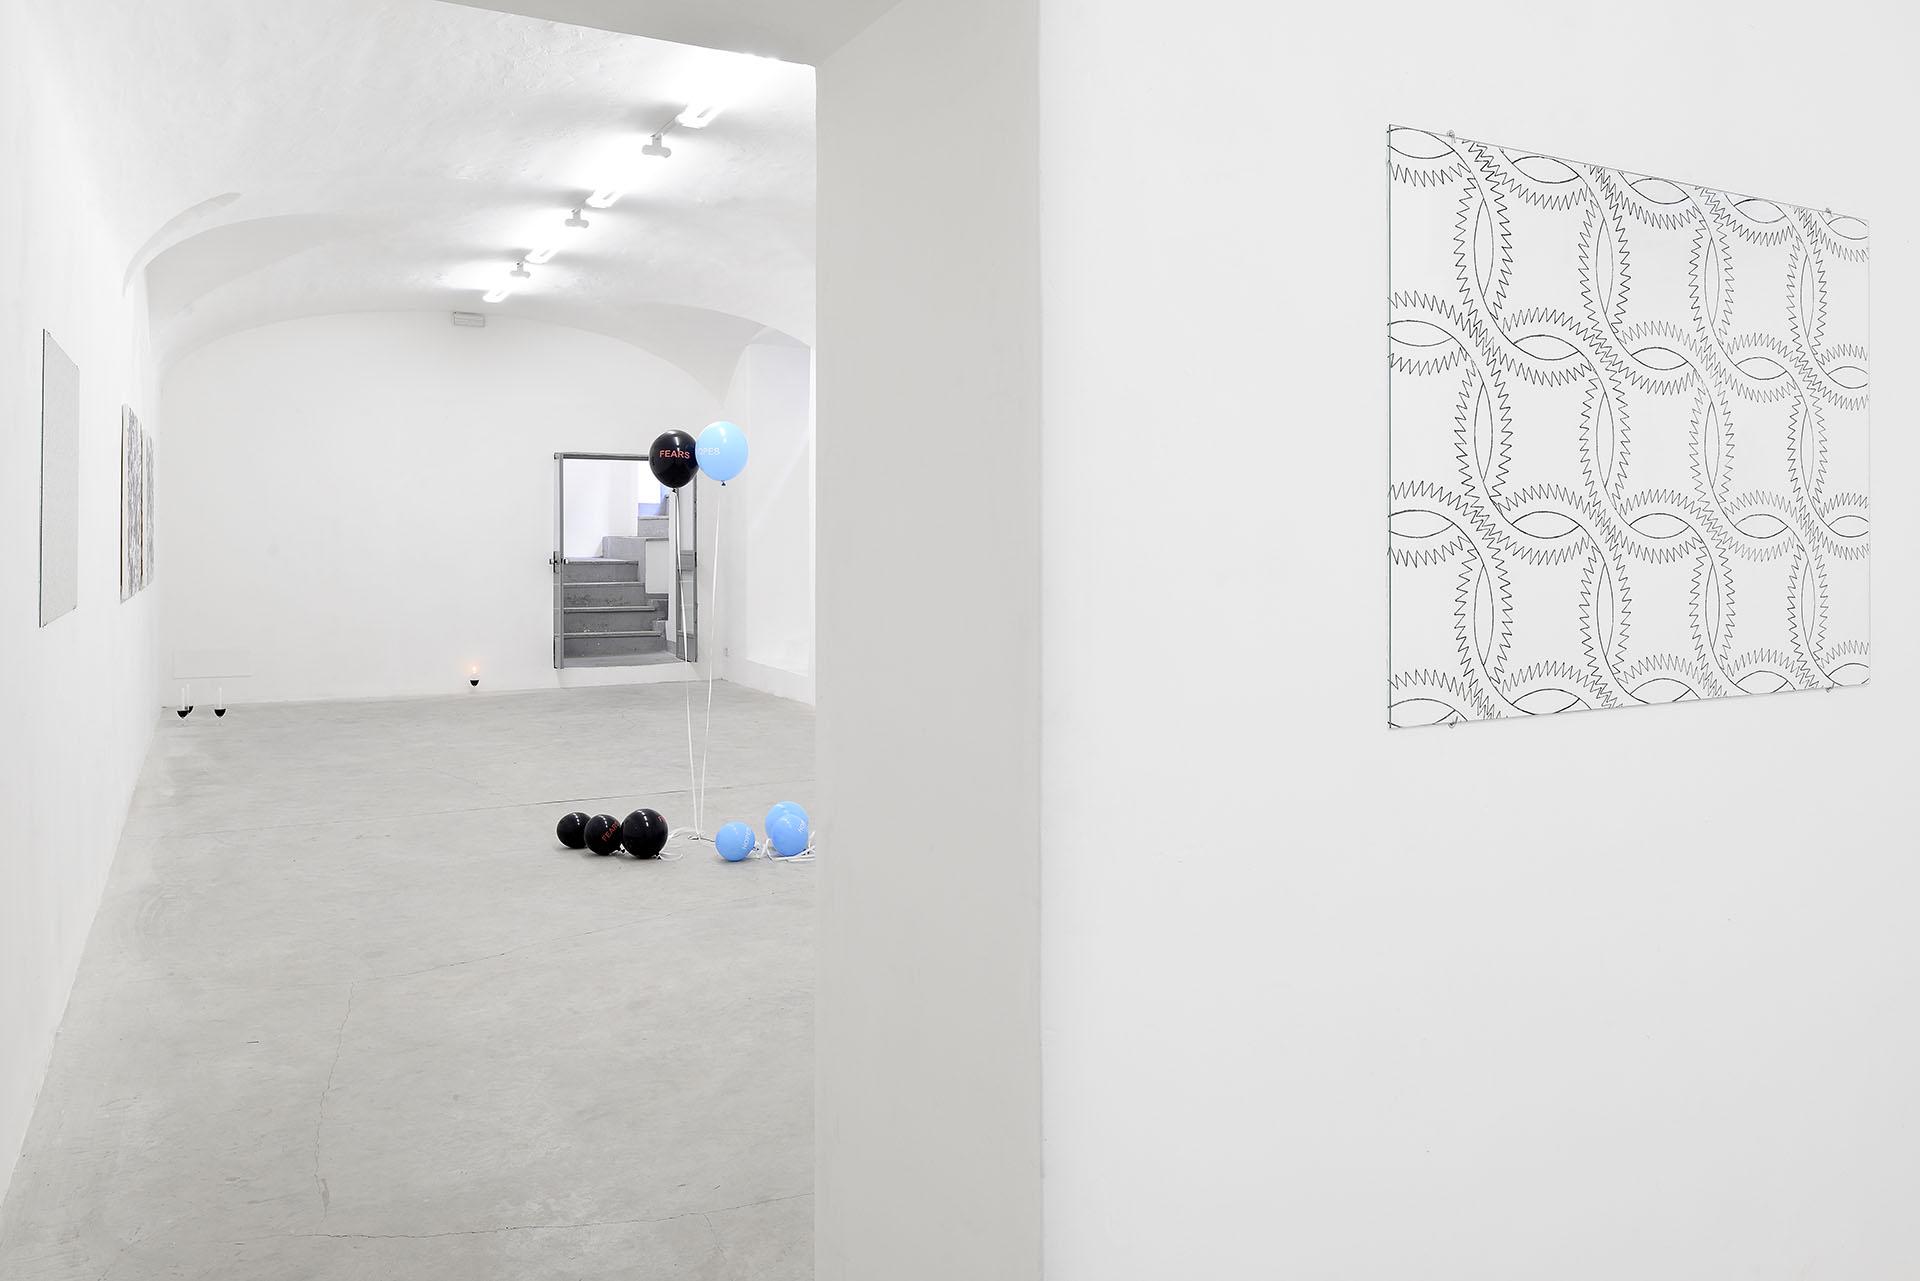 Sam Porritt, Hidden In Plain Sight, 2016. Installation View. Courtesy of Frutta, Rome, IT.